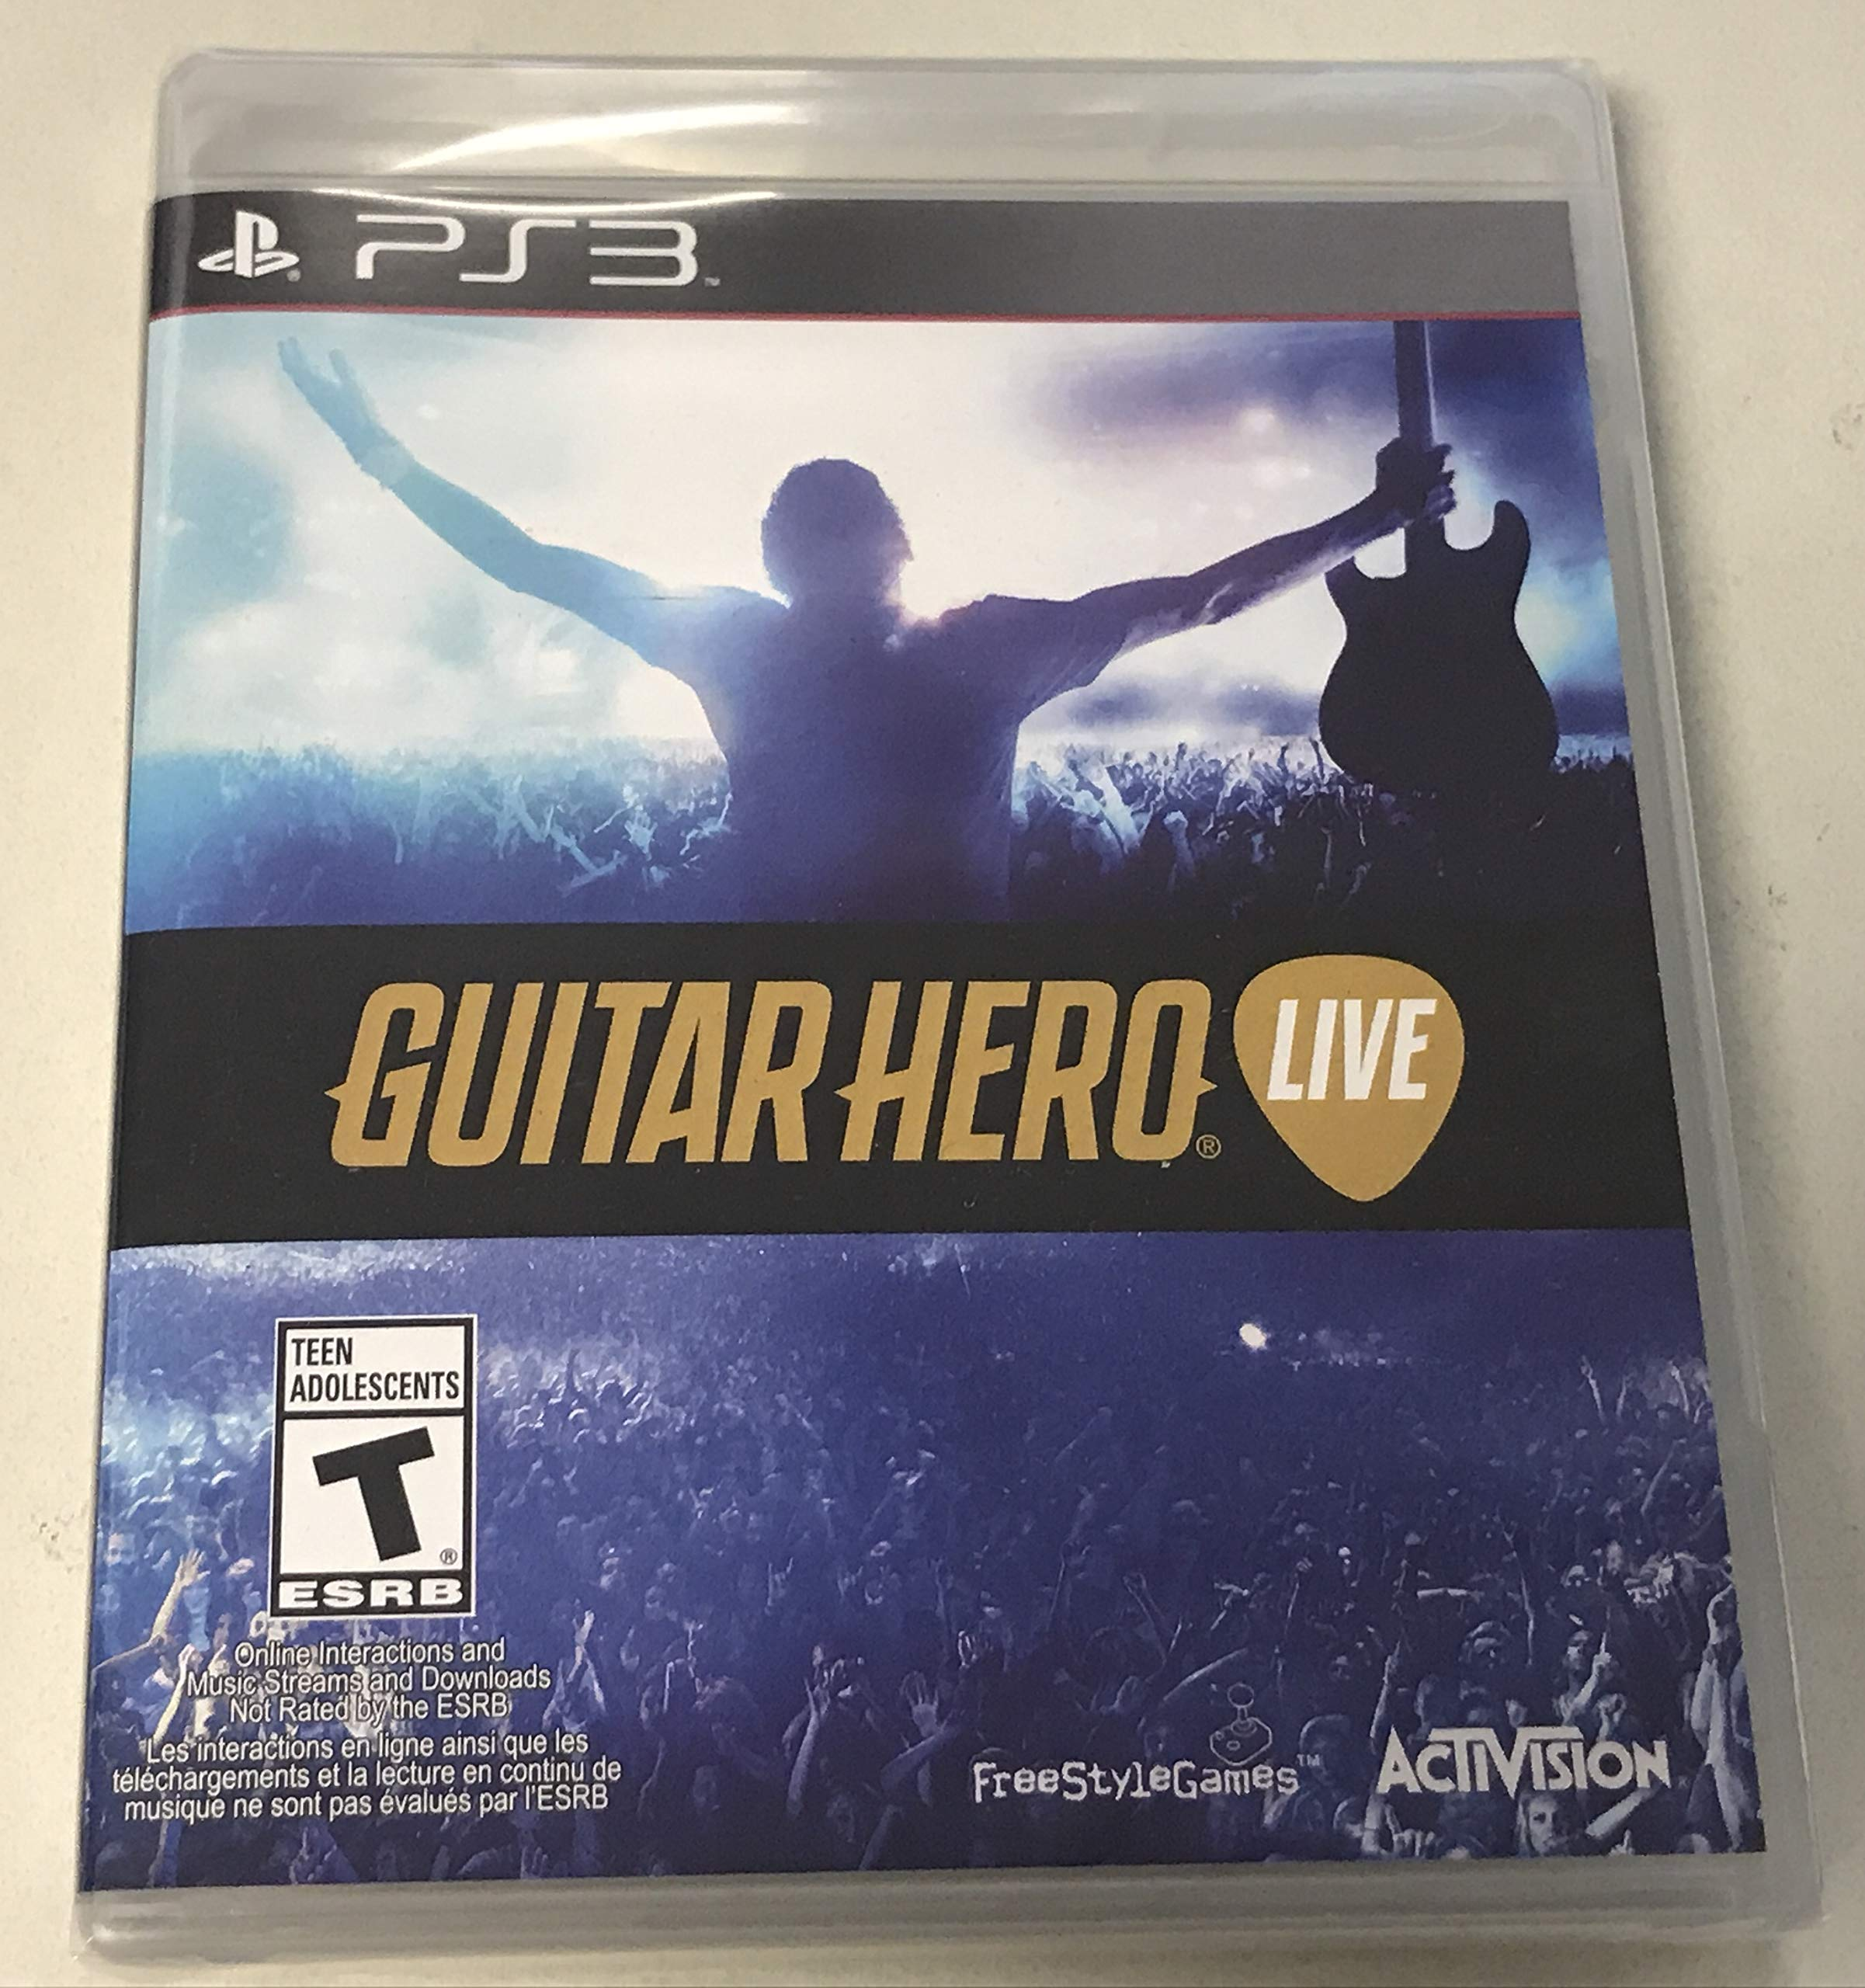 Guitar Hero Live 2 Pack Bundle - PlayStation 3